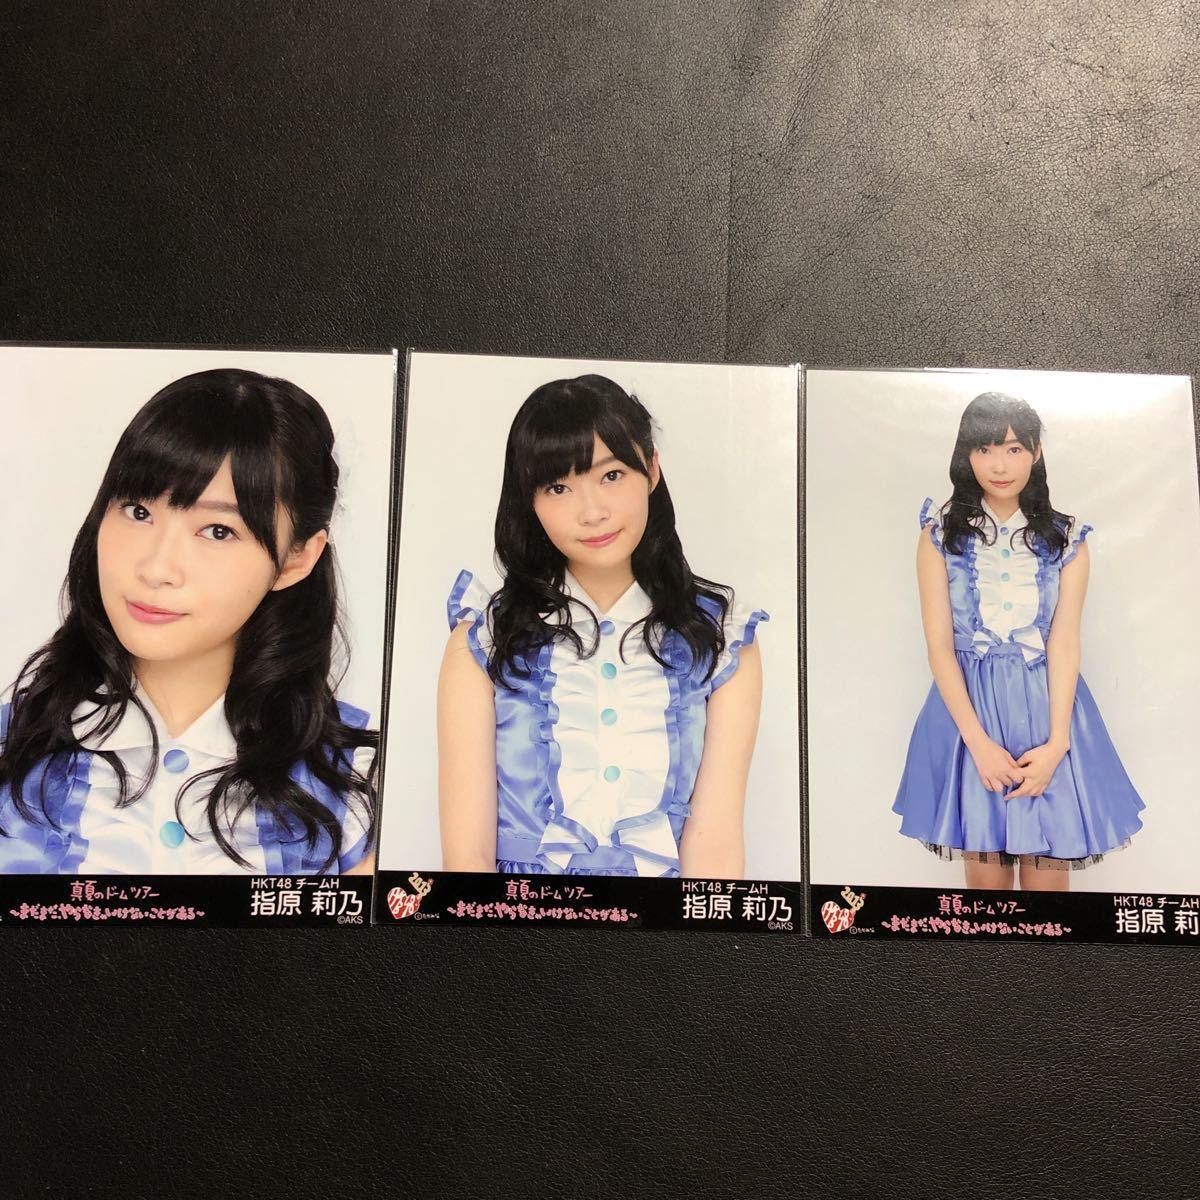 HKT48 指原莉乃 AKB48 真夏のドームツアー 2013 会場 生写真 コンプ